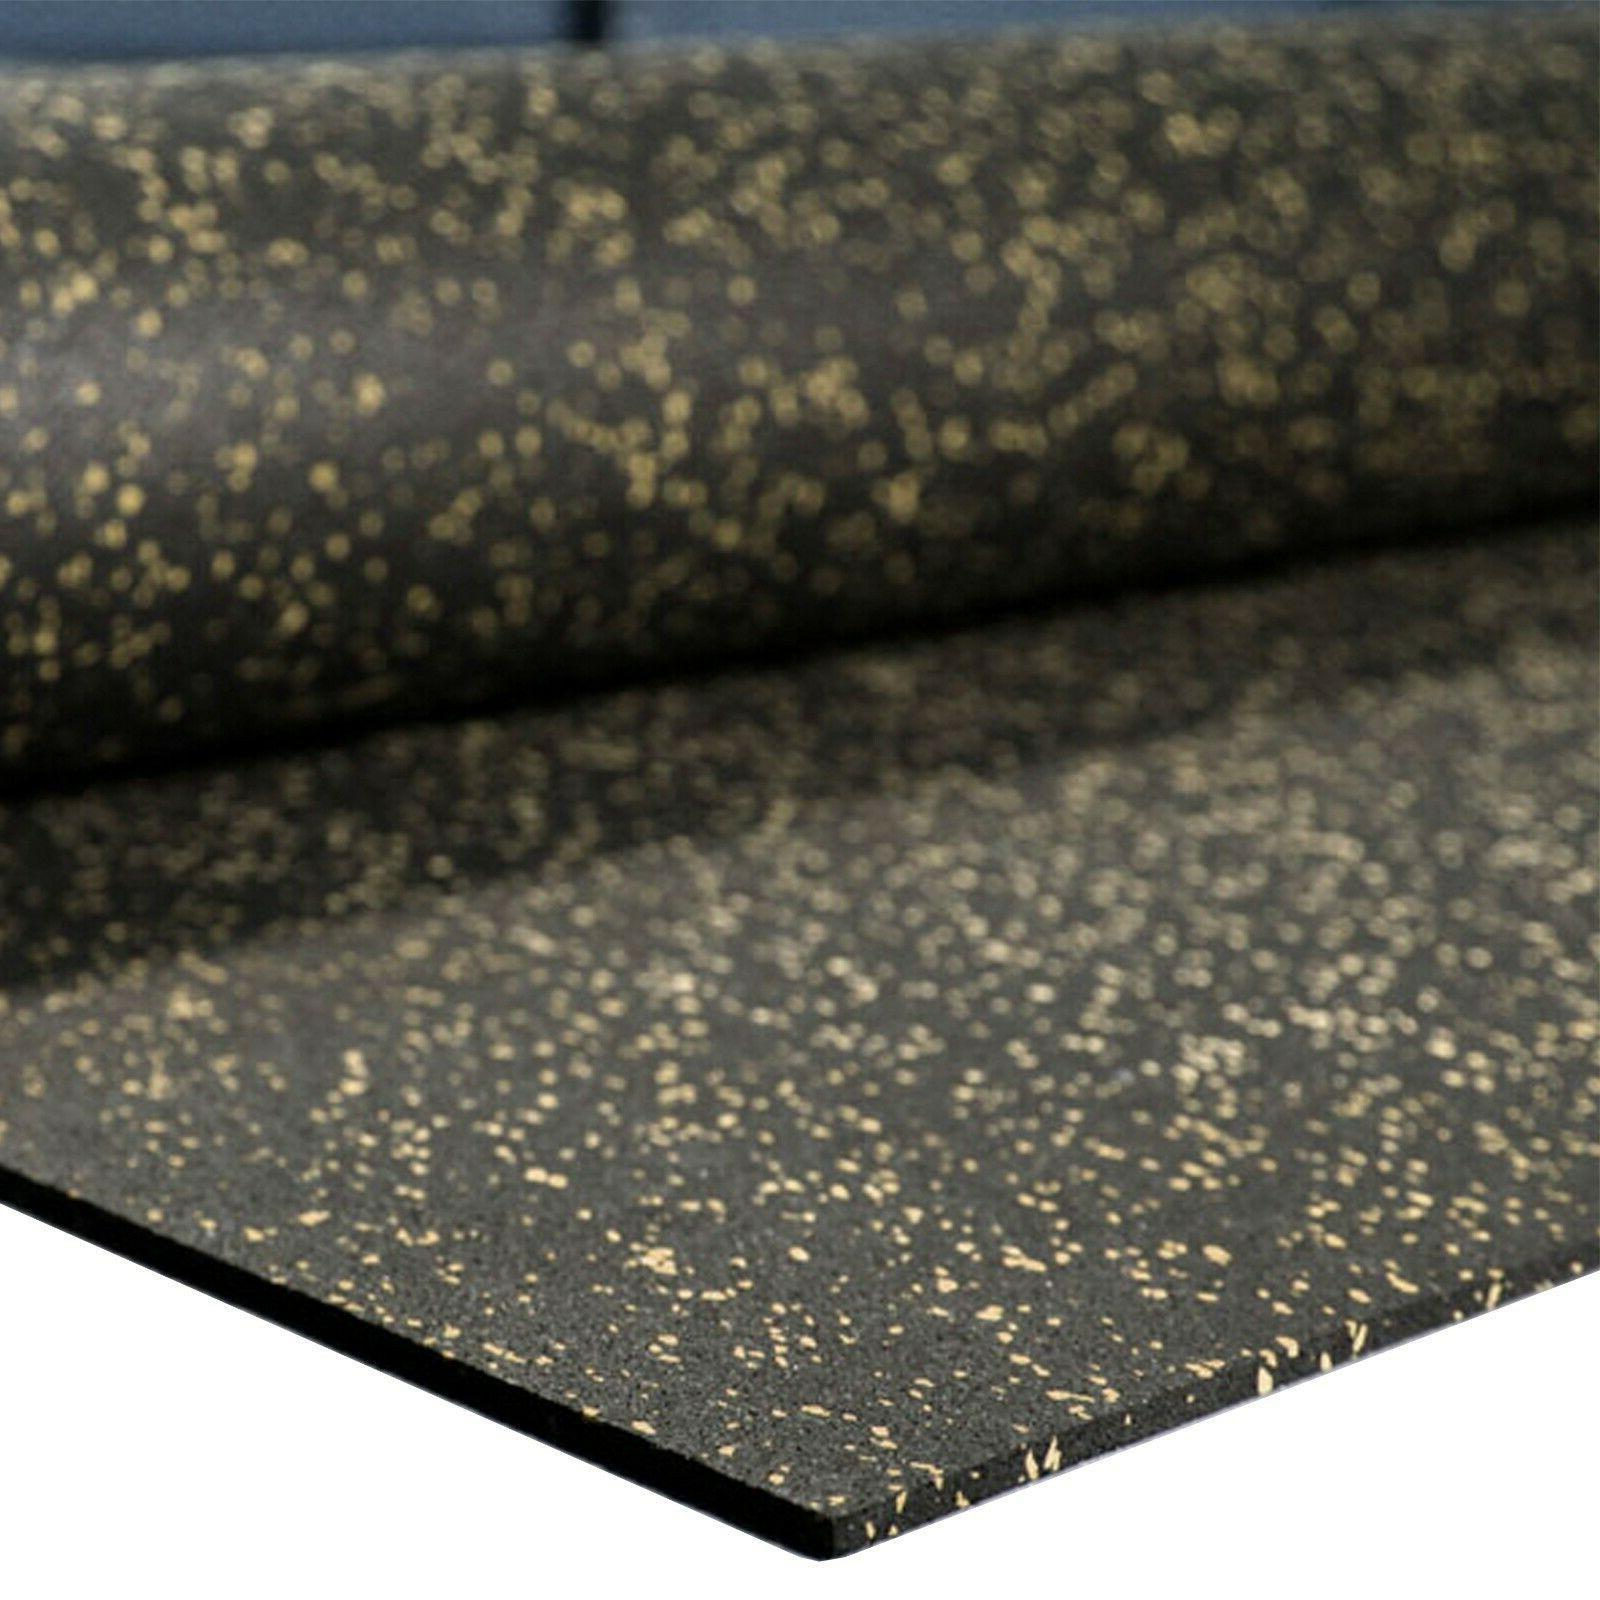 rubber mats 4ft x10ft high quality home